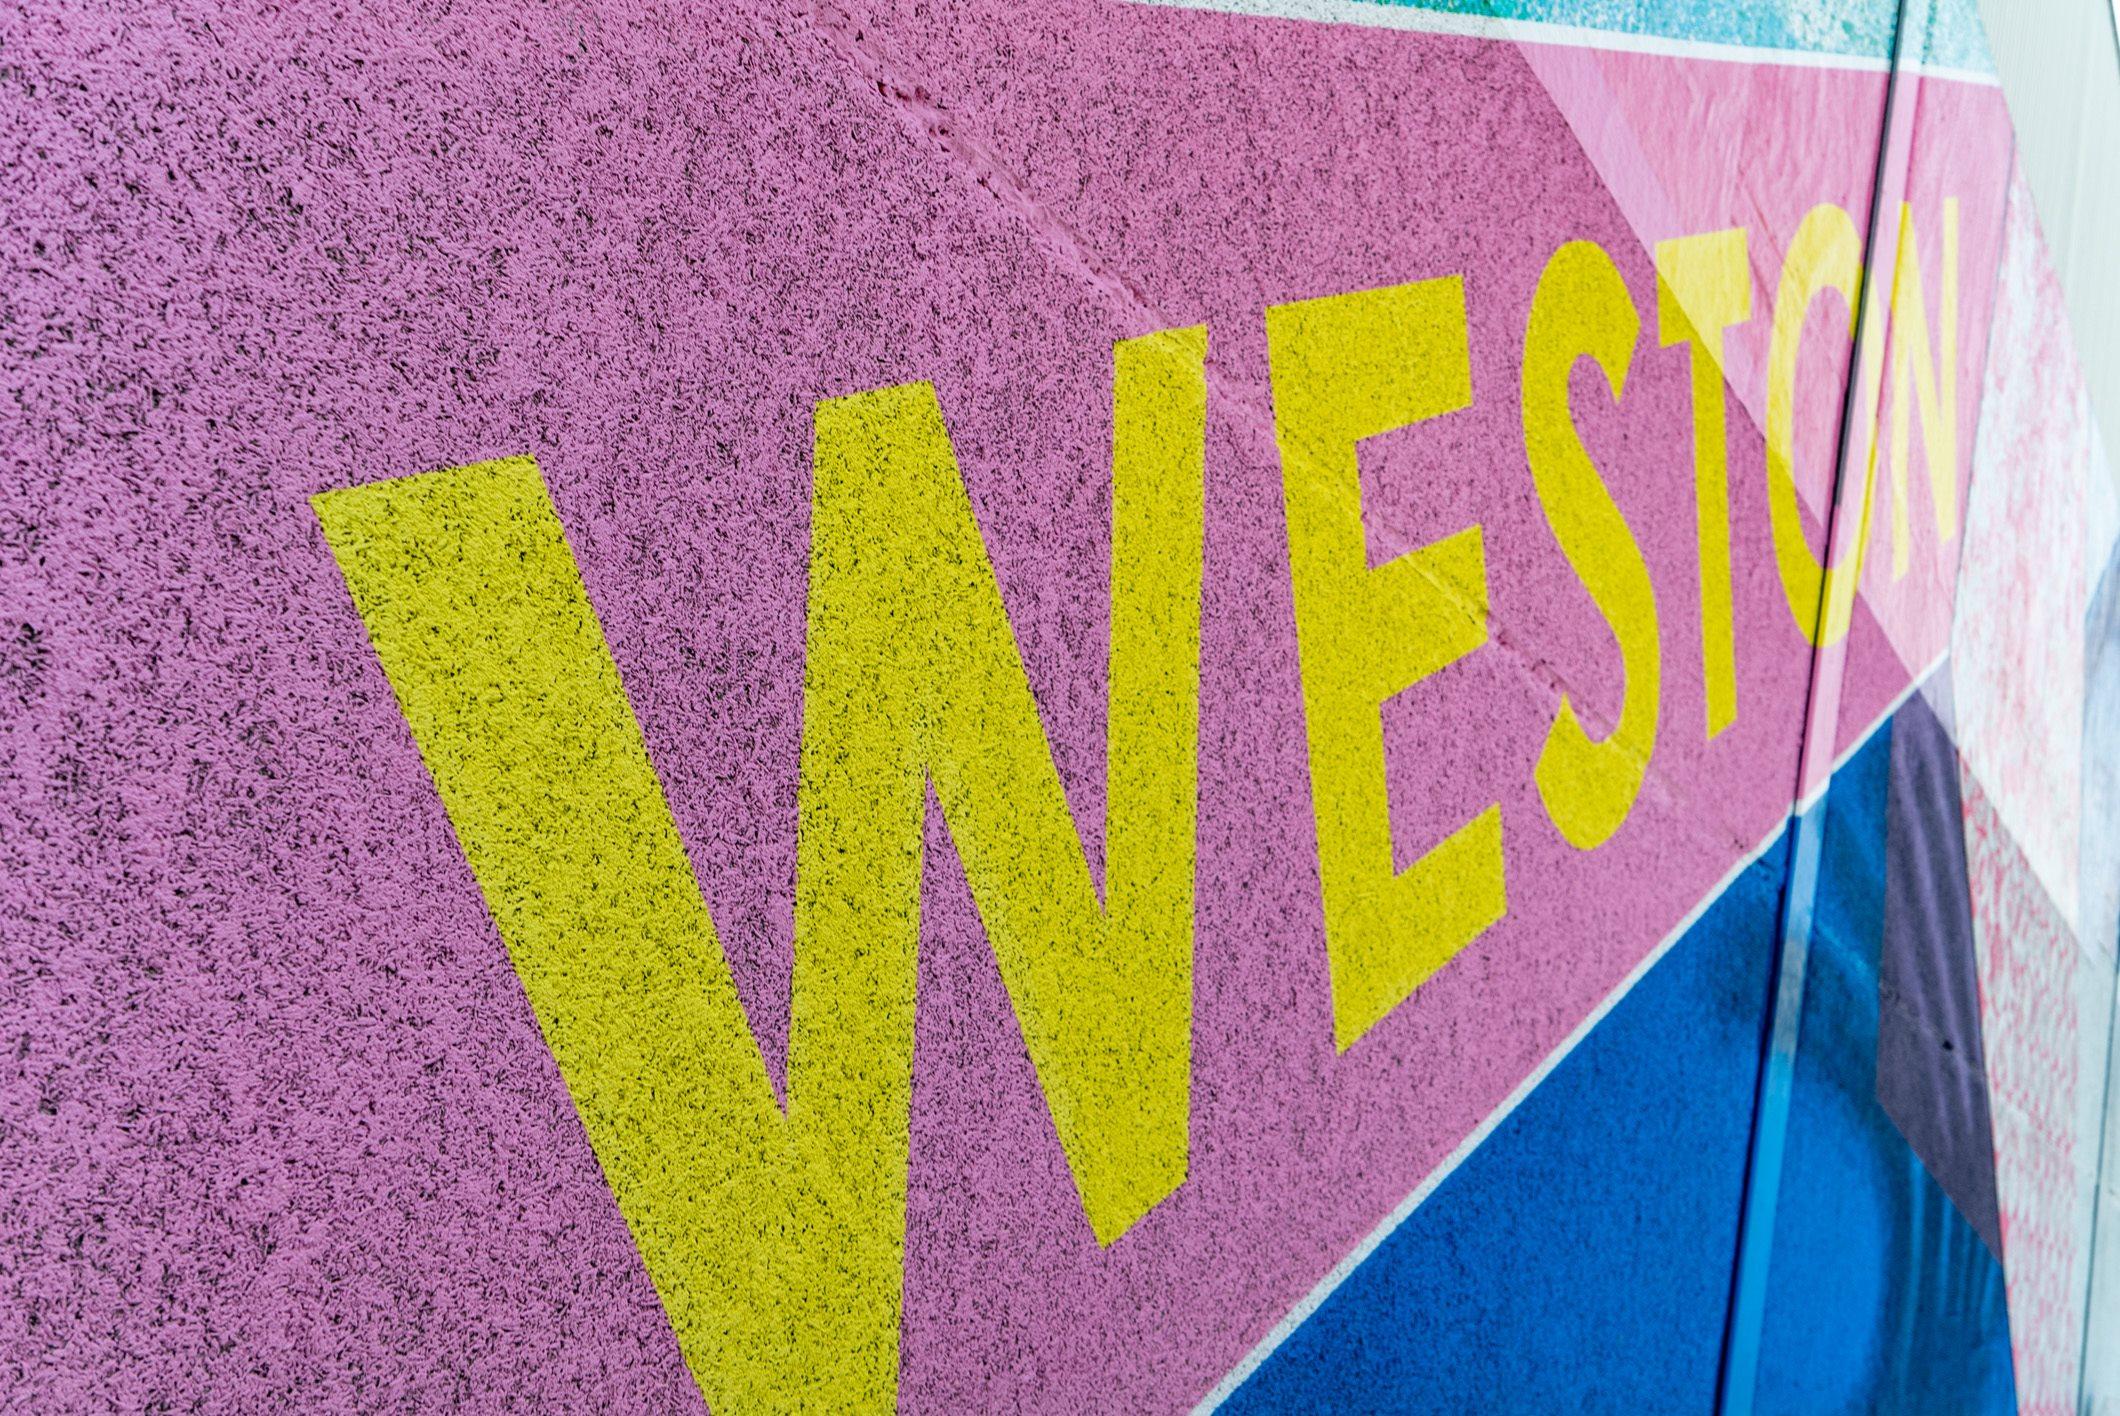 Weston UP Express Station